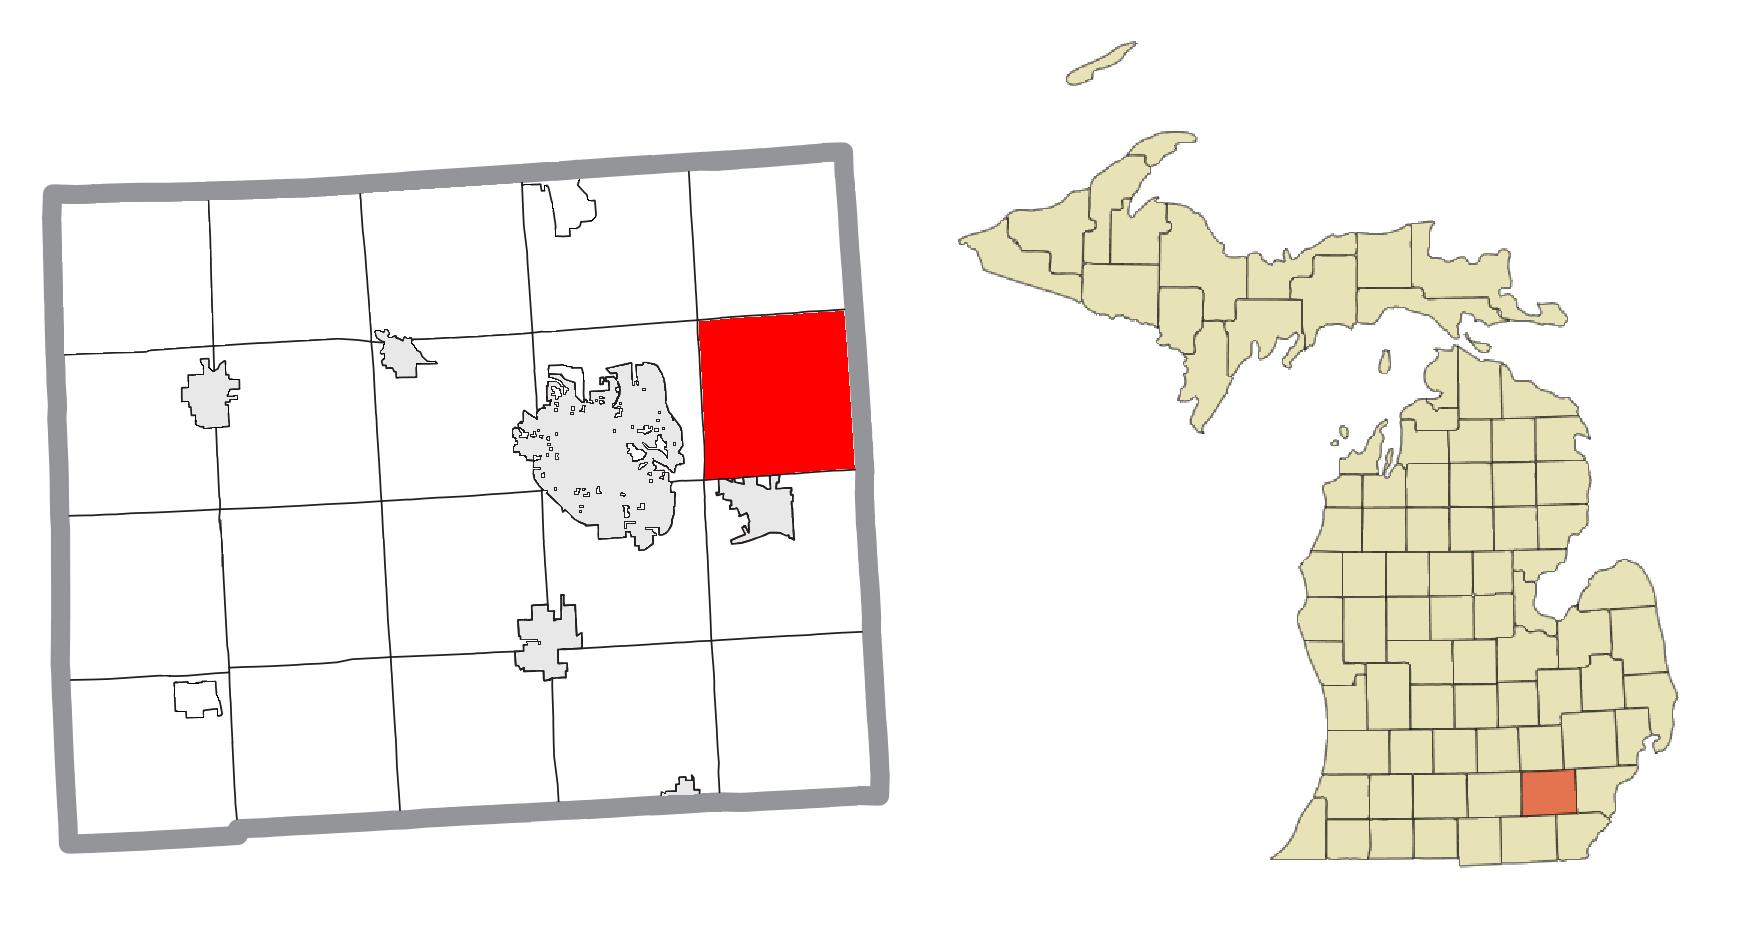 Superior Township, Washtenaw County, Michigan - Wikipedia